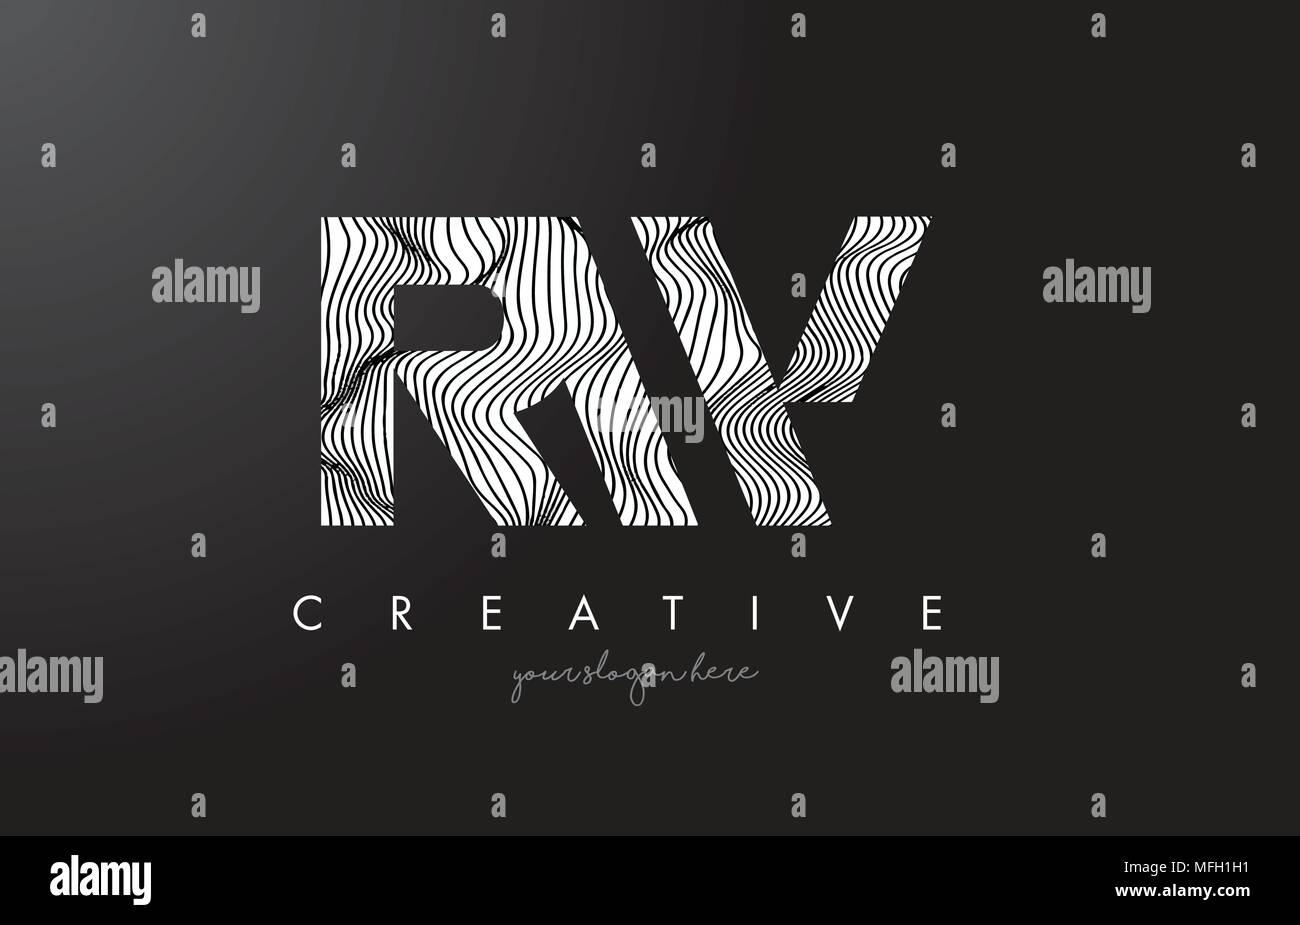 RW R W Letter Logo with Zebra Lines Texture Design Vector Illustration. - Stock Image